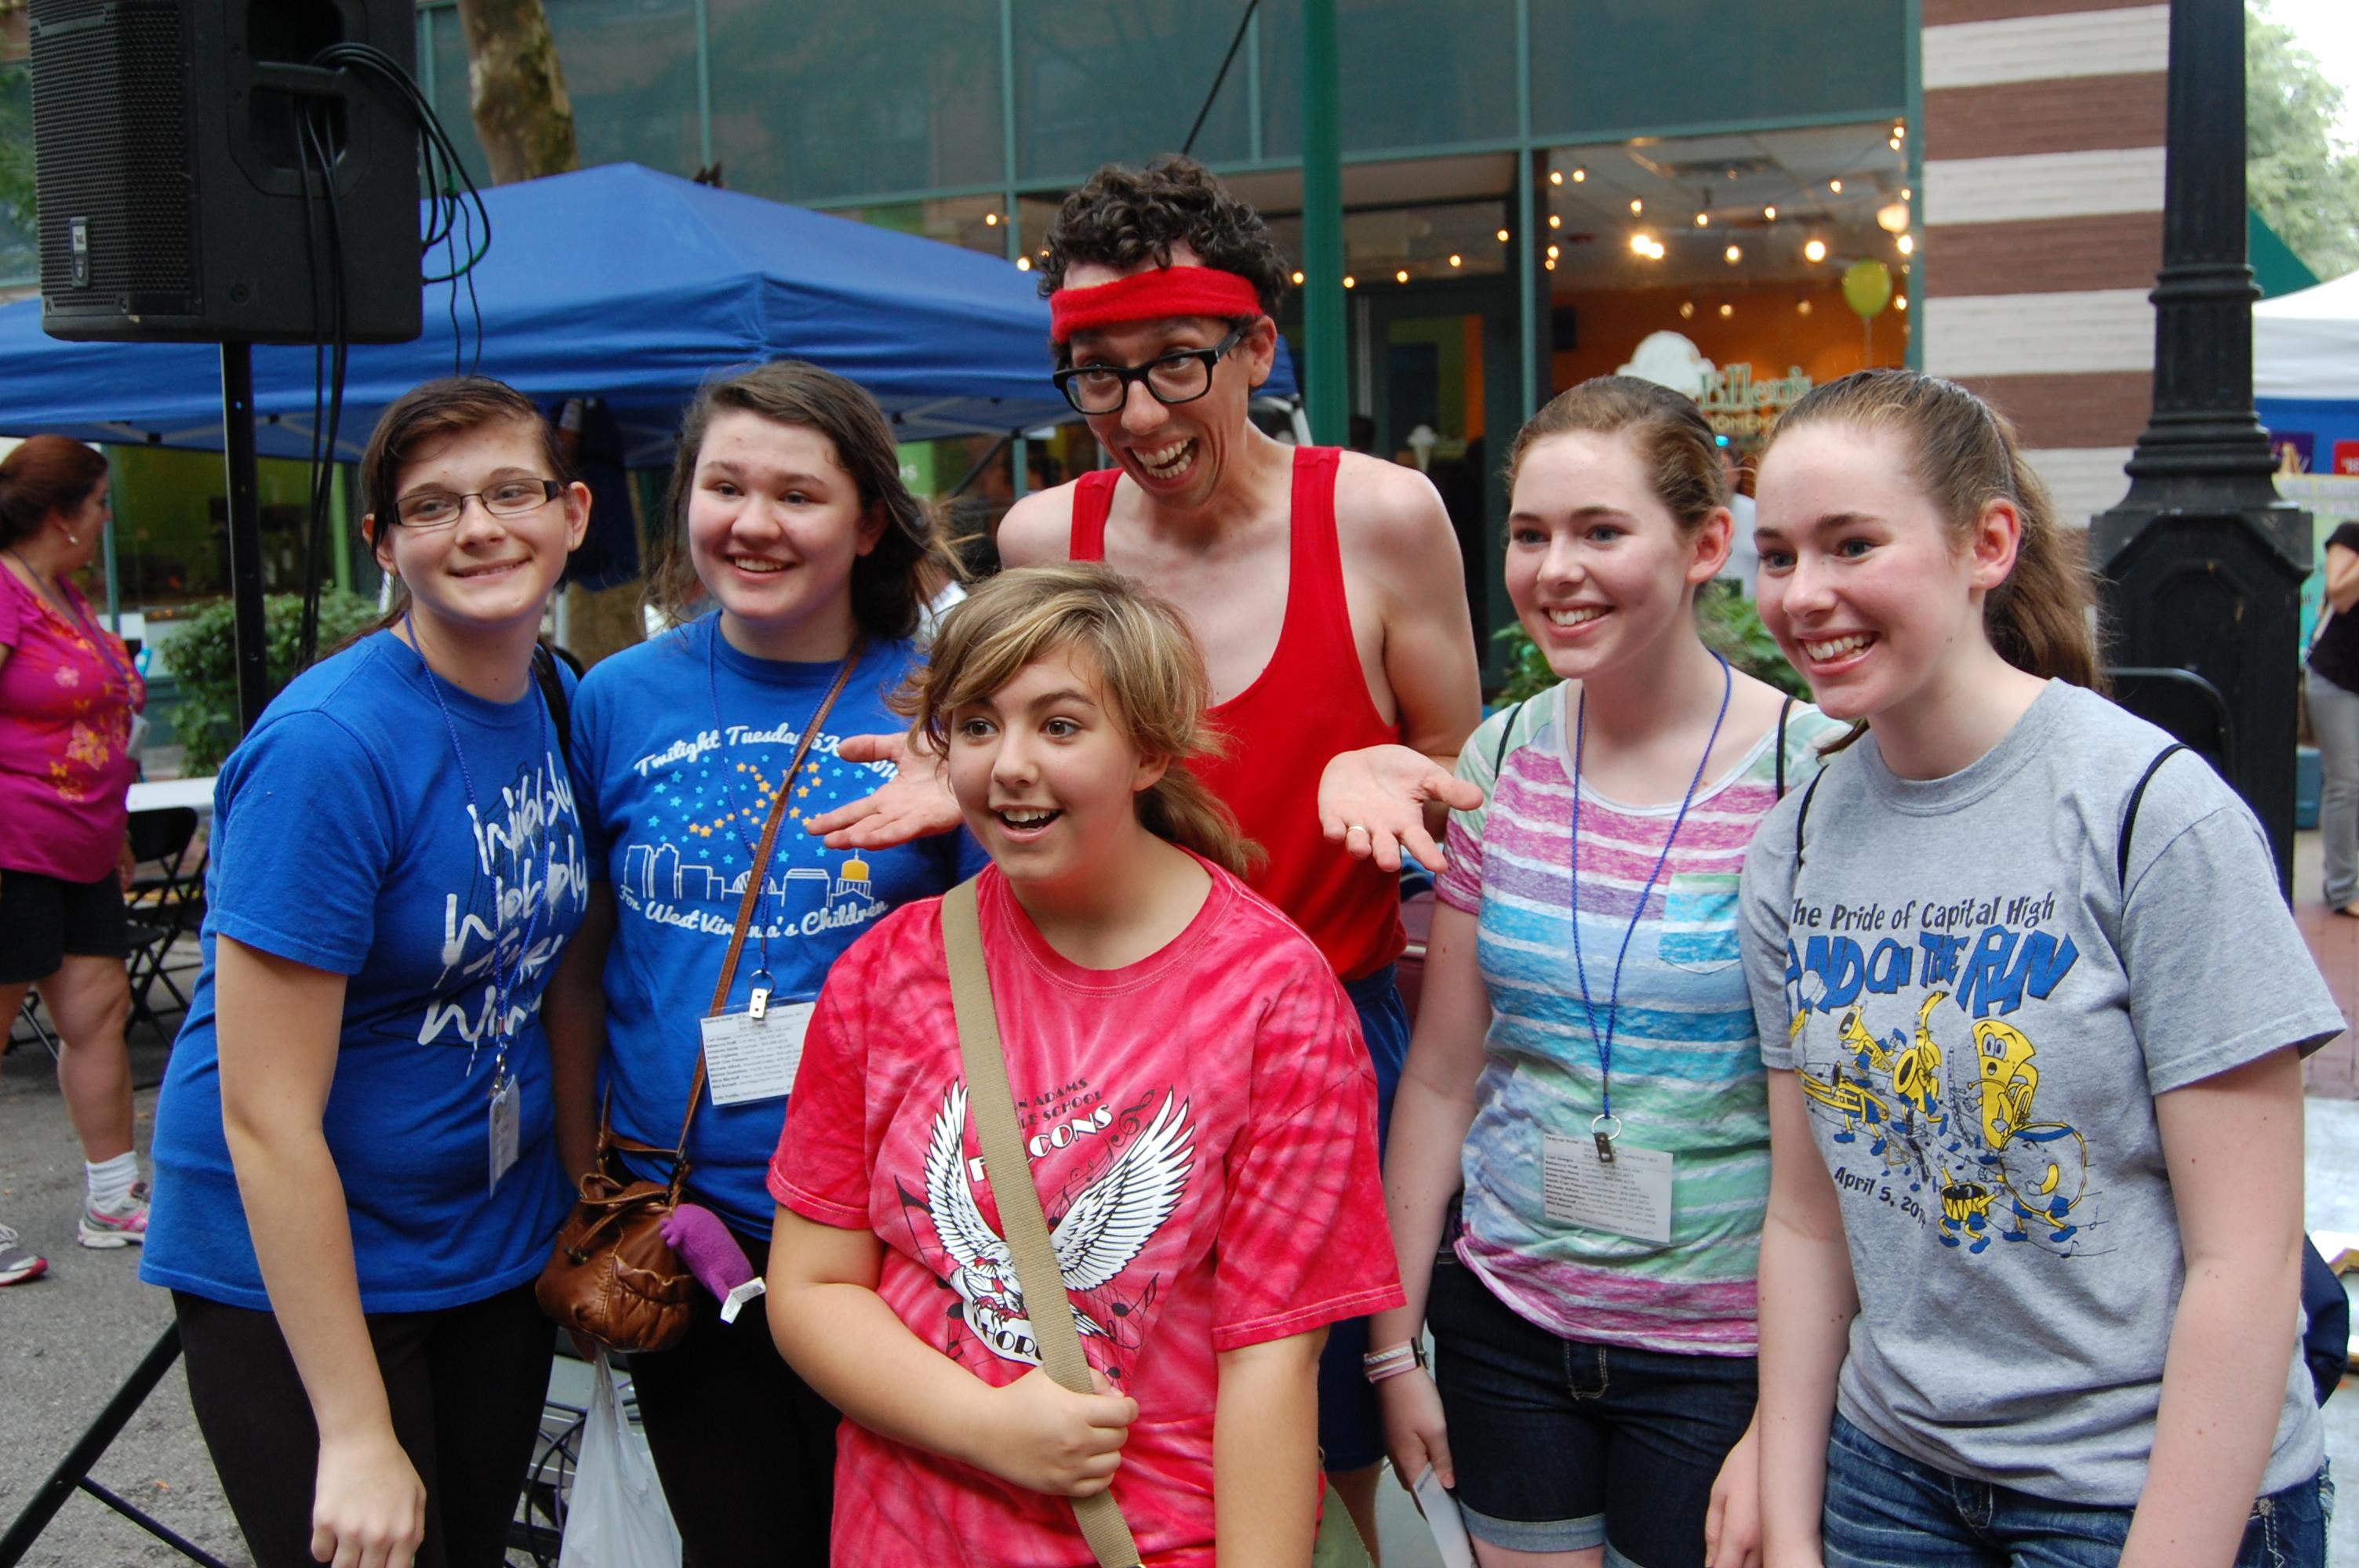 Group at FestivALL street fair